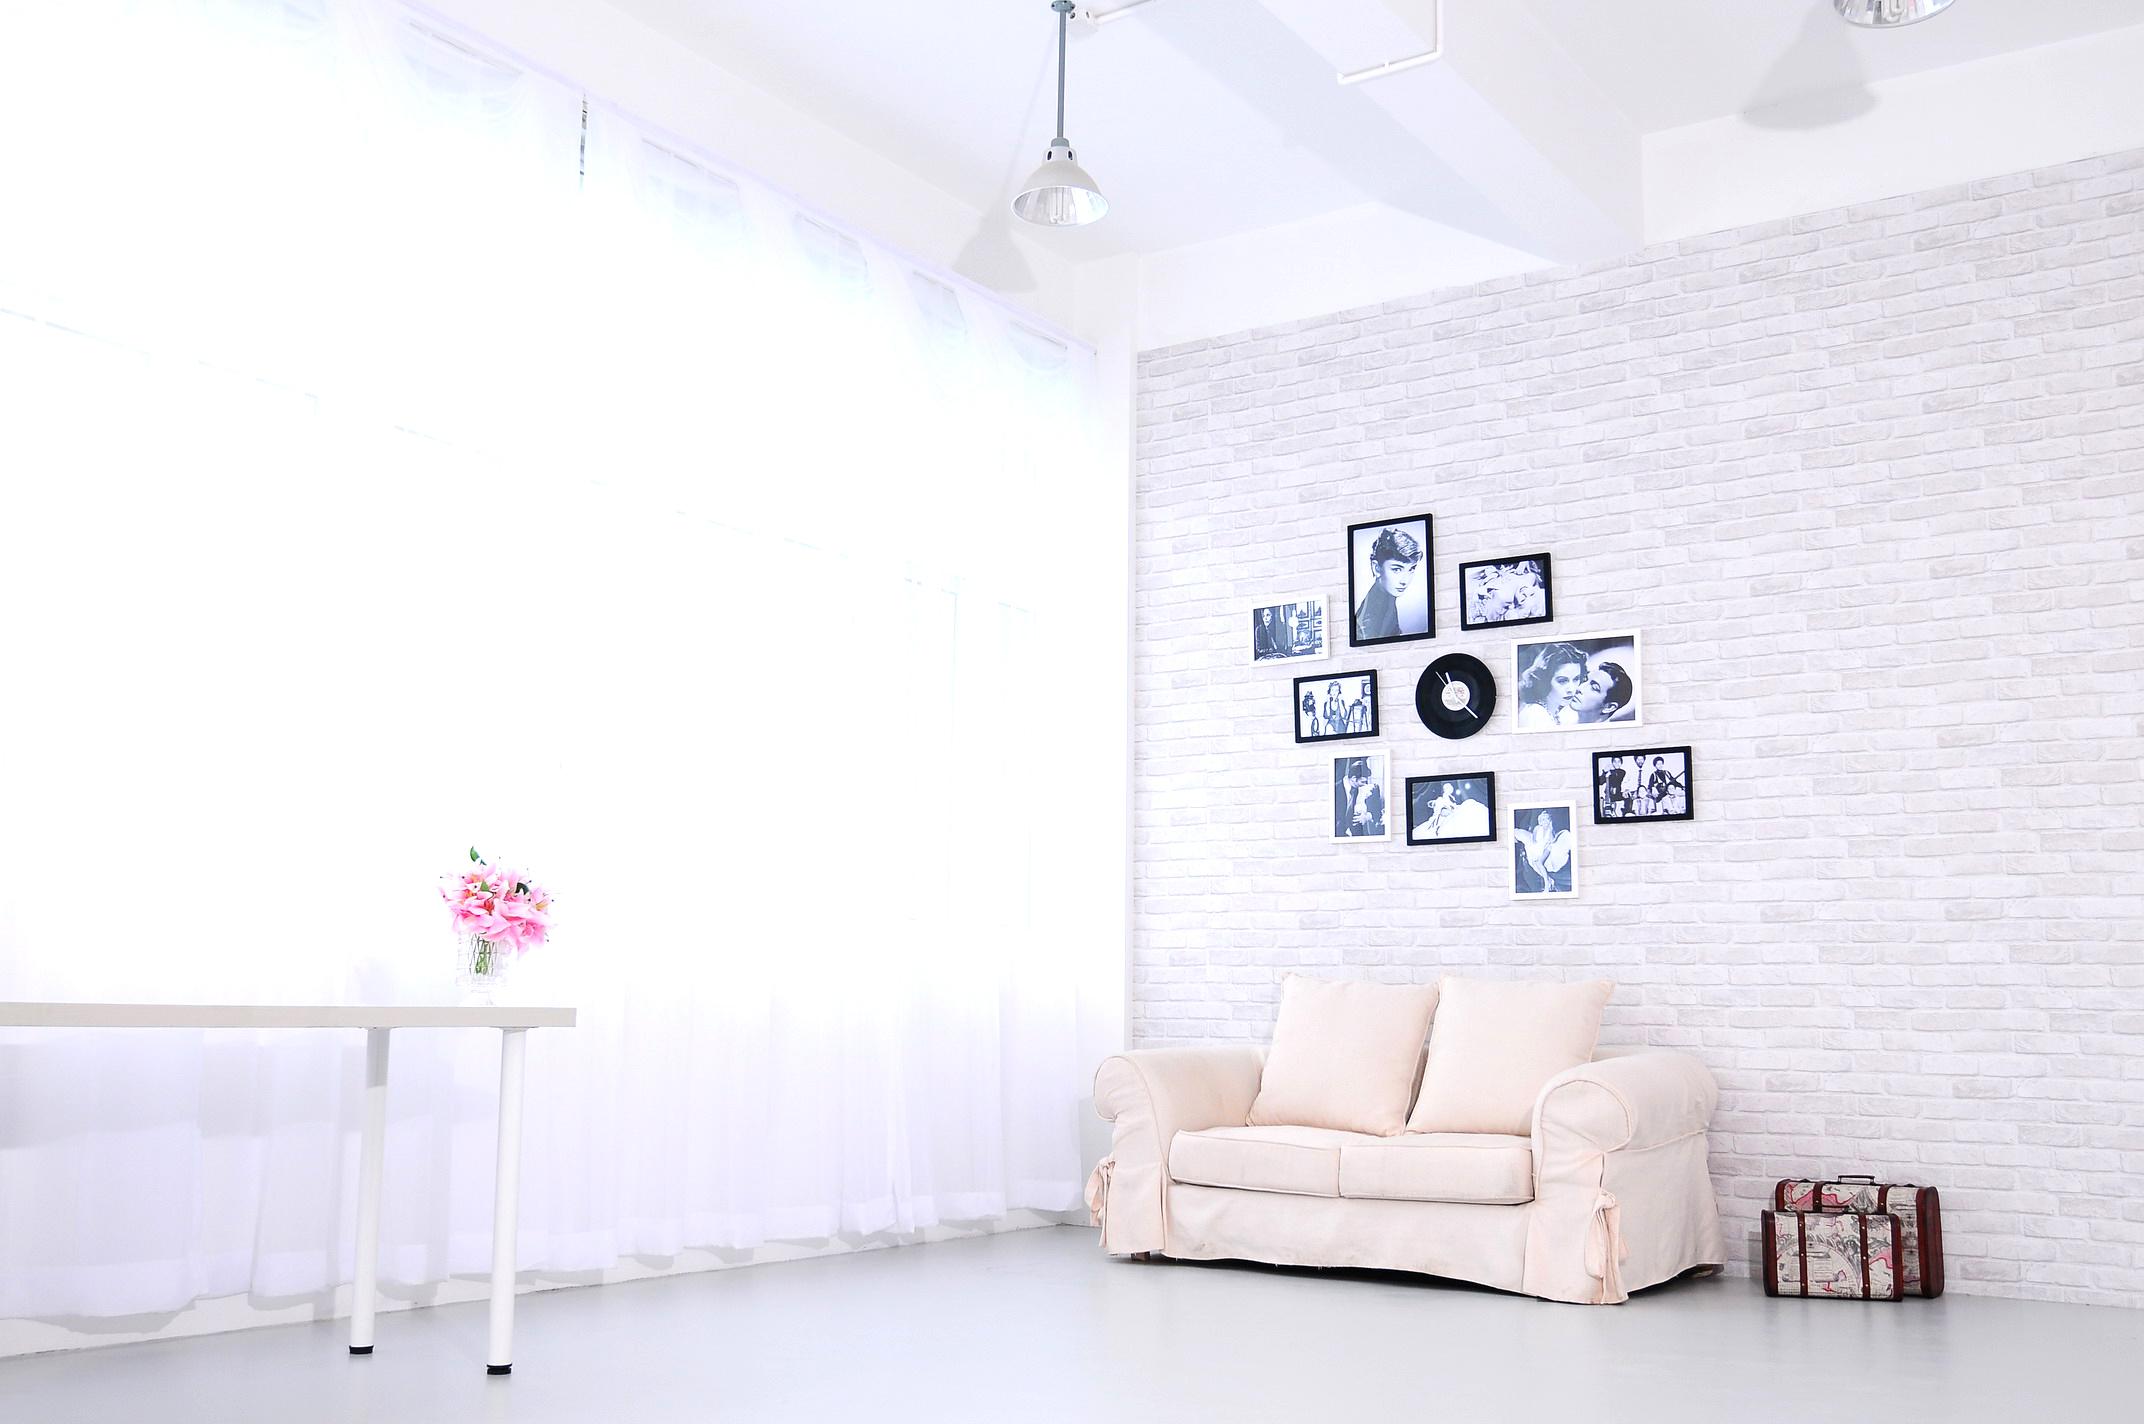 Natural Light Multi-Purpose Room